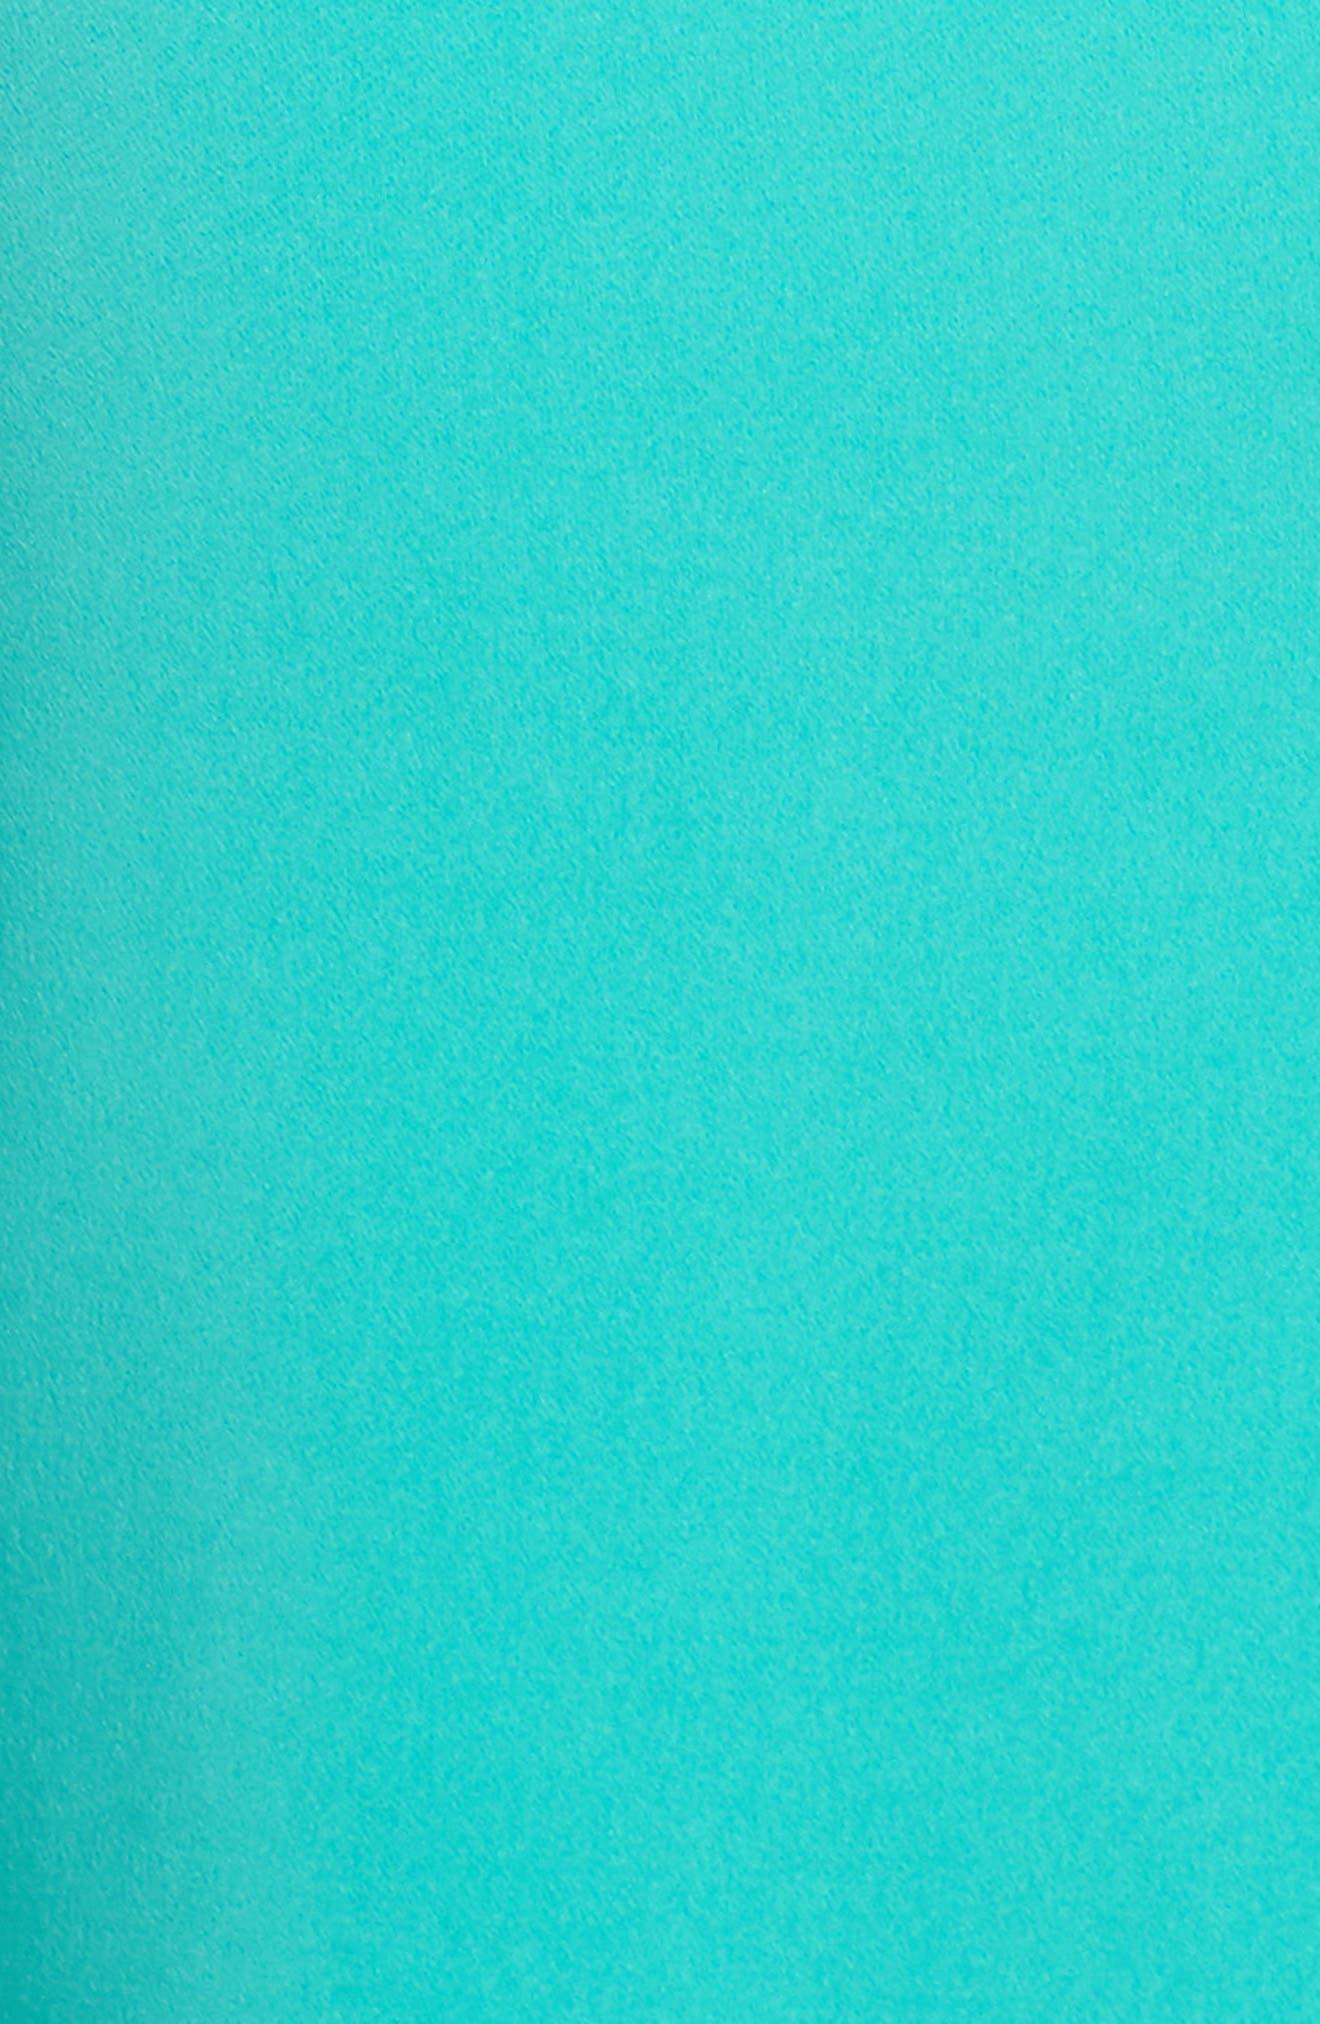 Cameron One-Shoulder Cutout Gown,                             Alternate thumbnail 6, color,                             384